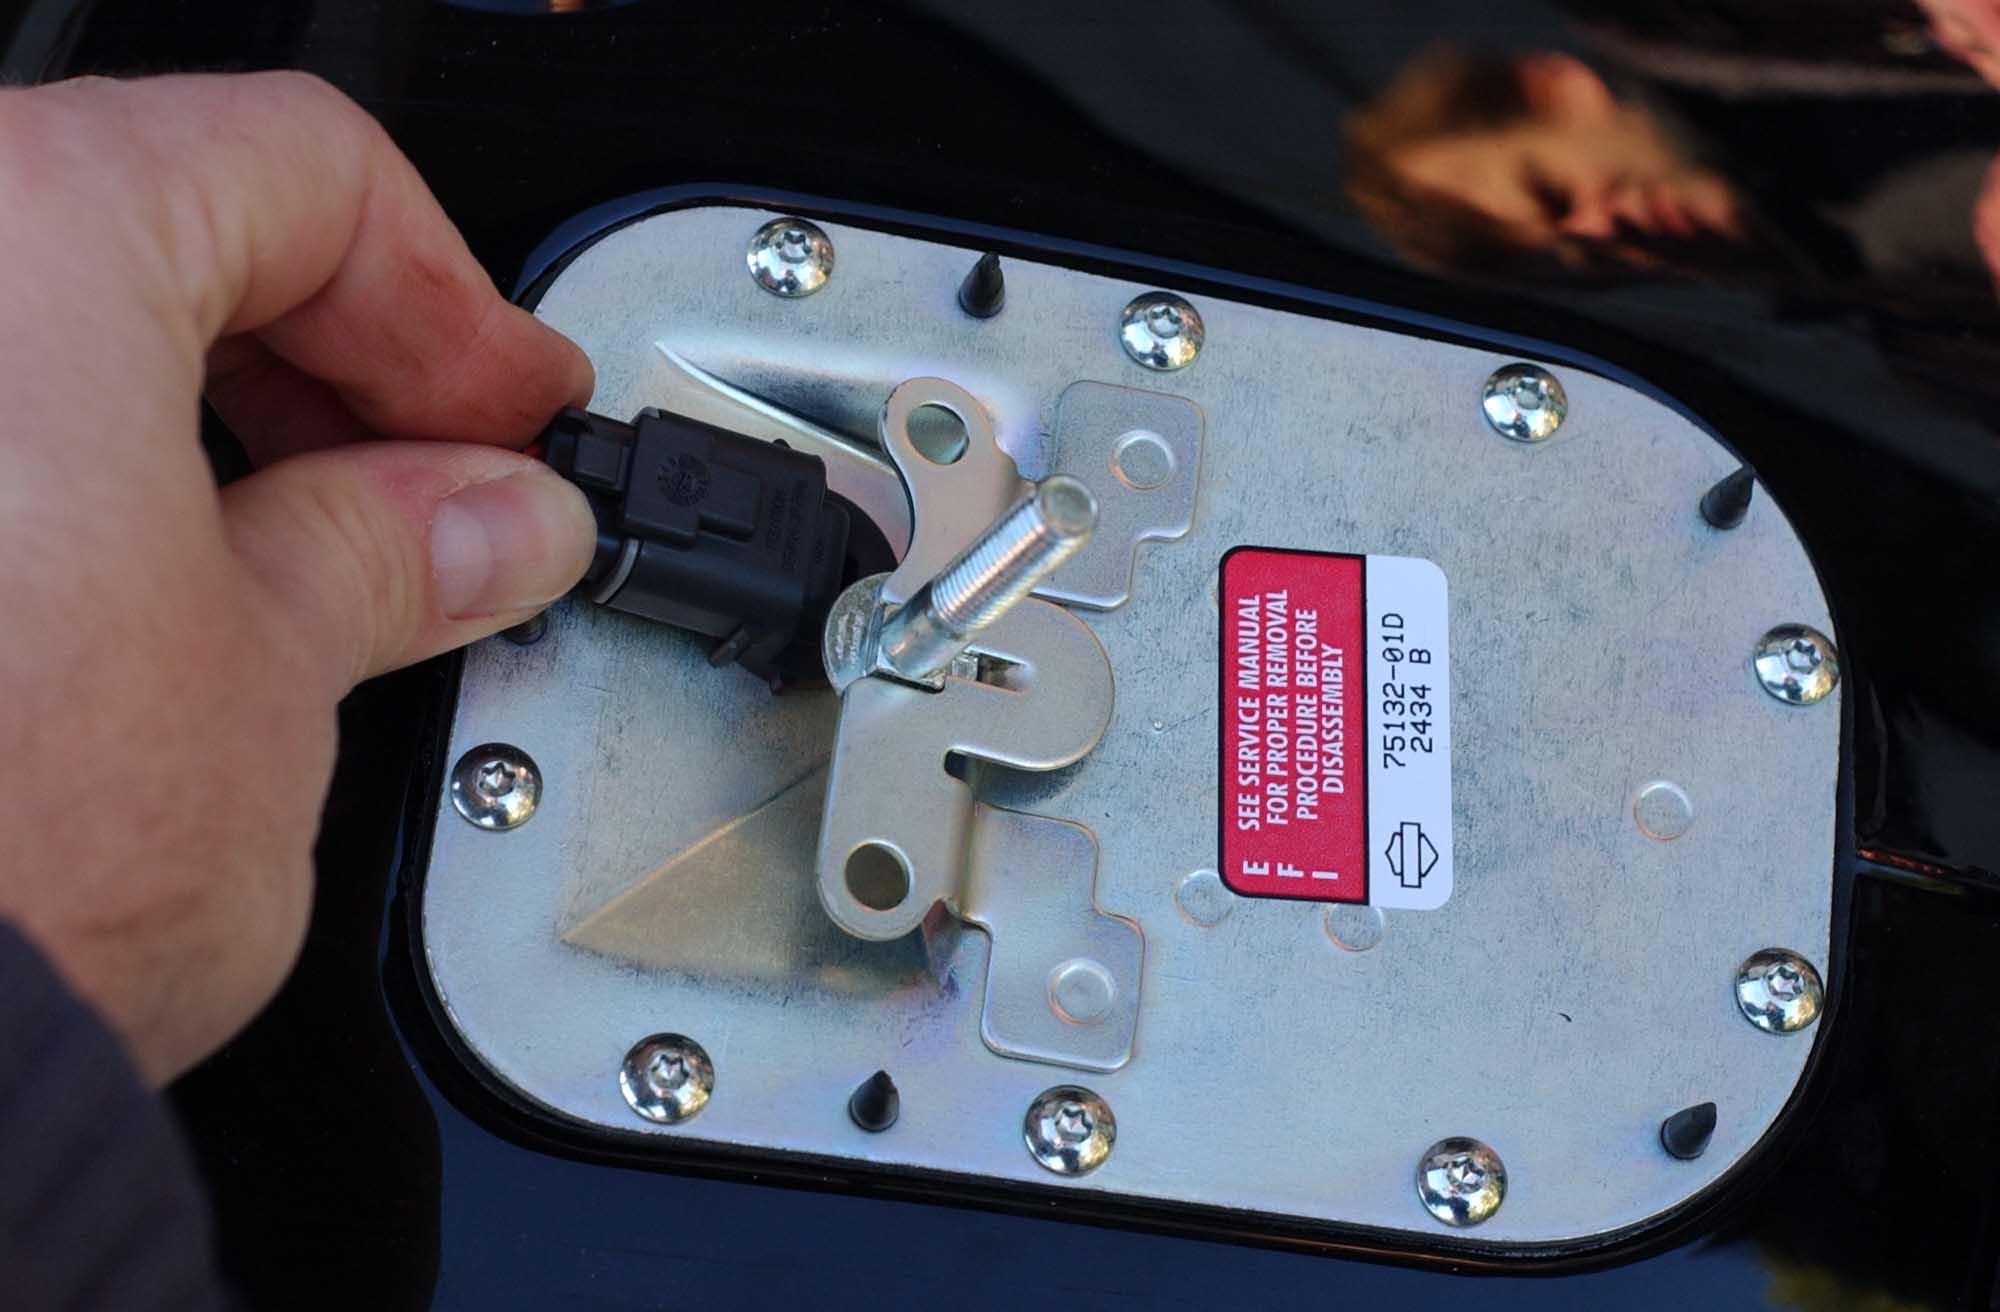 From Efi To Carburetor Upgrade Instructions Harley Davidson Sportster Fuse Box Location